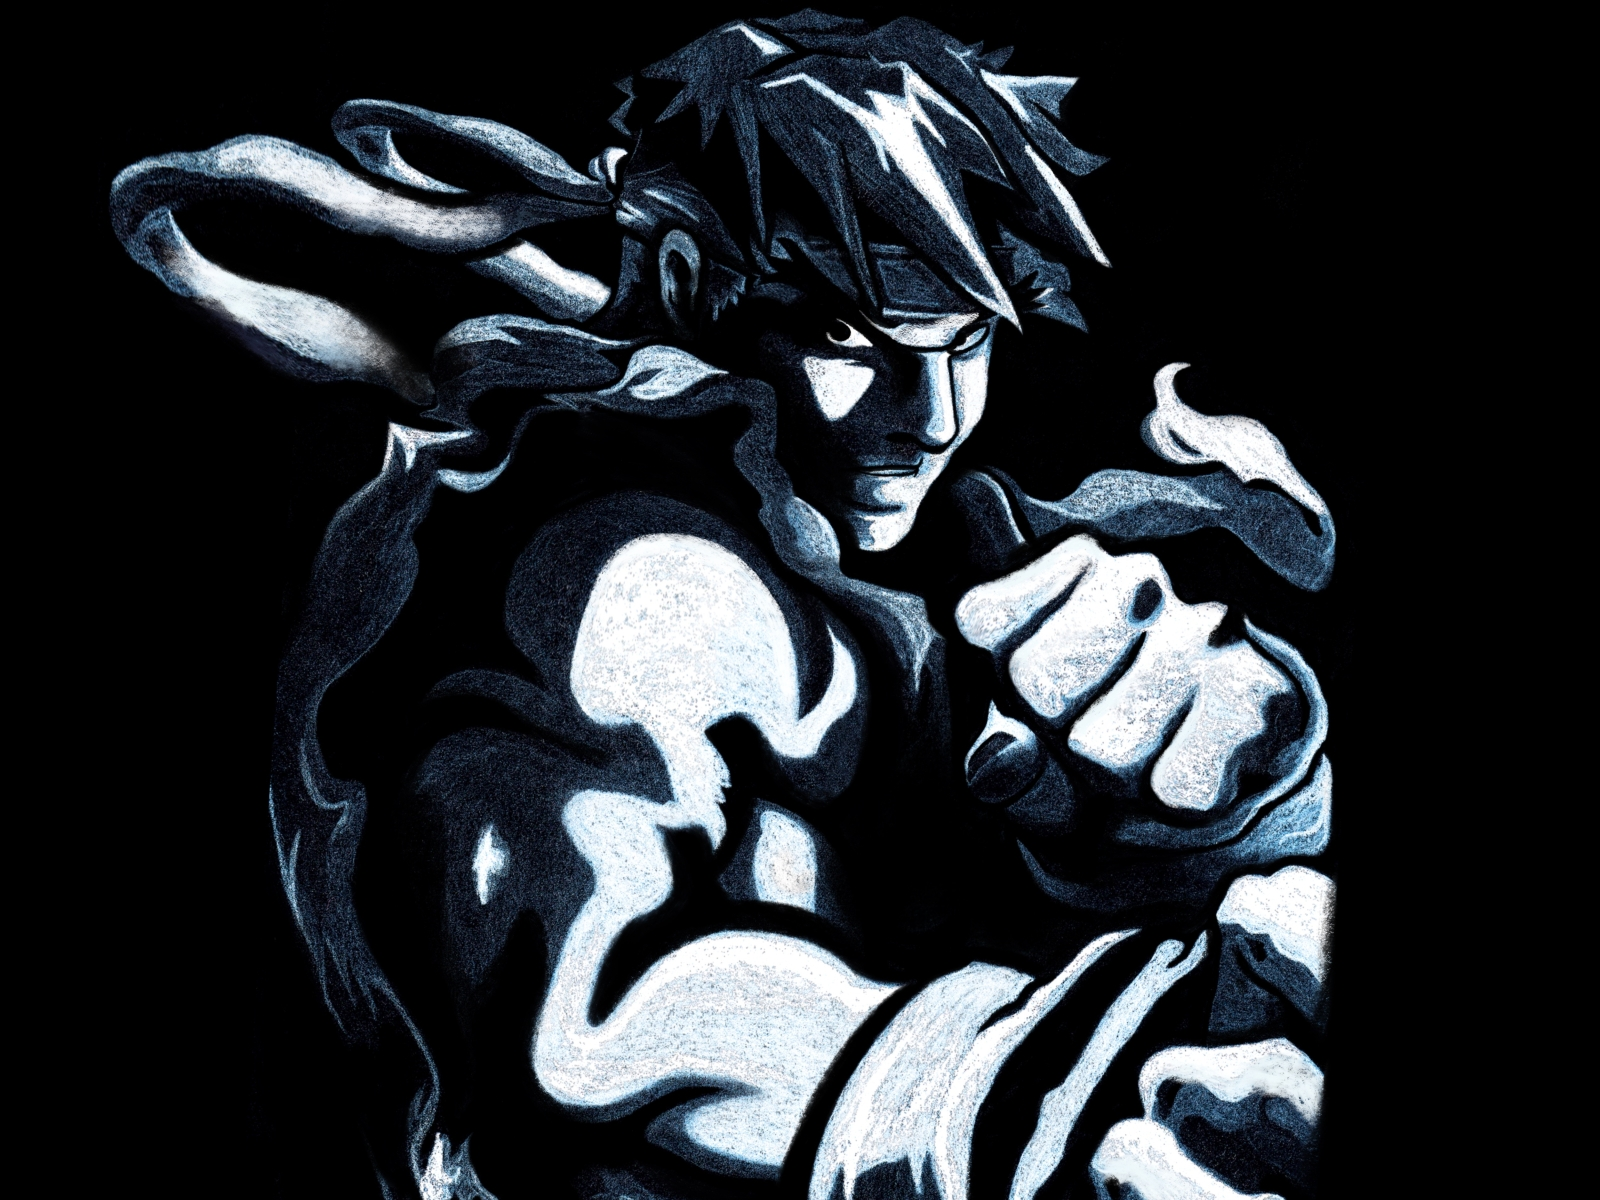 Street Fighter Ryu By Ivan Ramirez On Dribbble